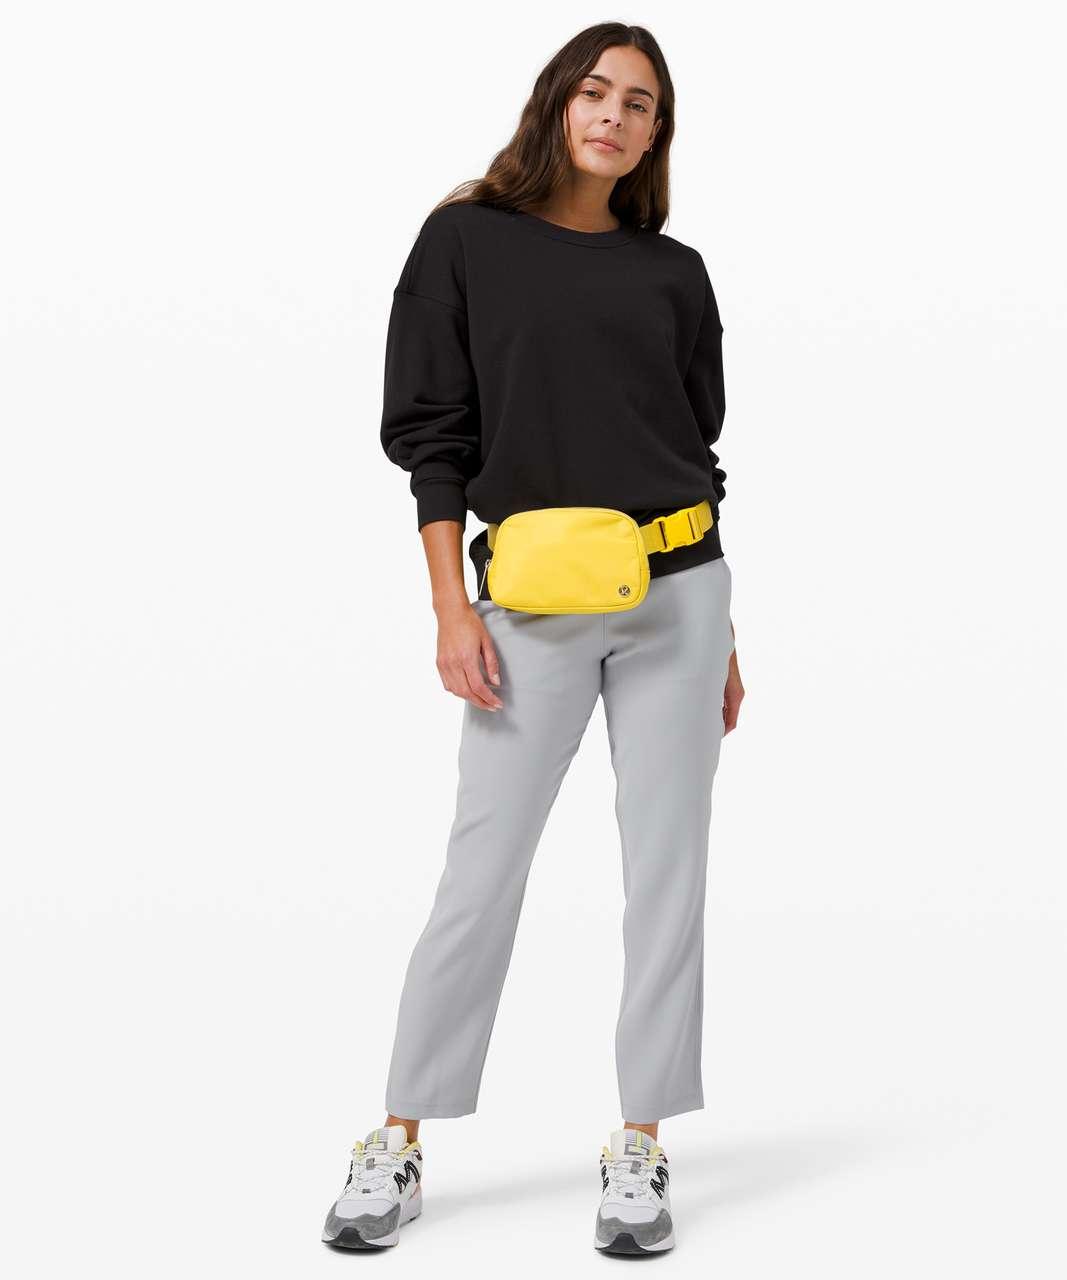 Lululemon Everywhere Belt Bag *1L - Soleil